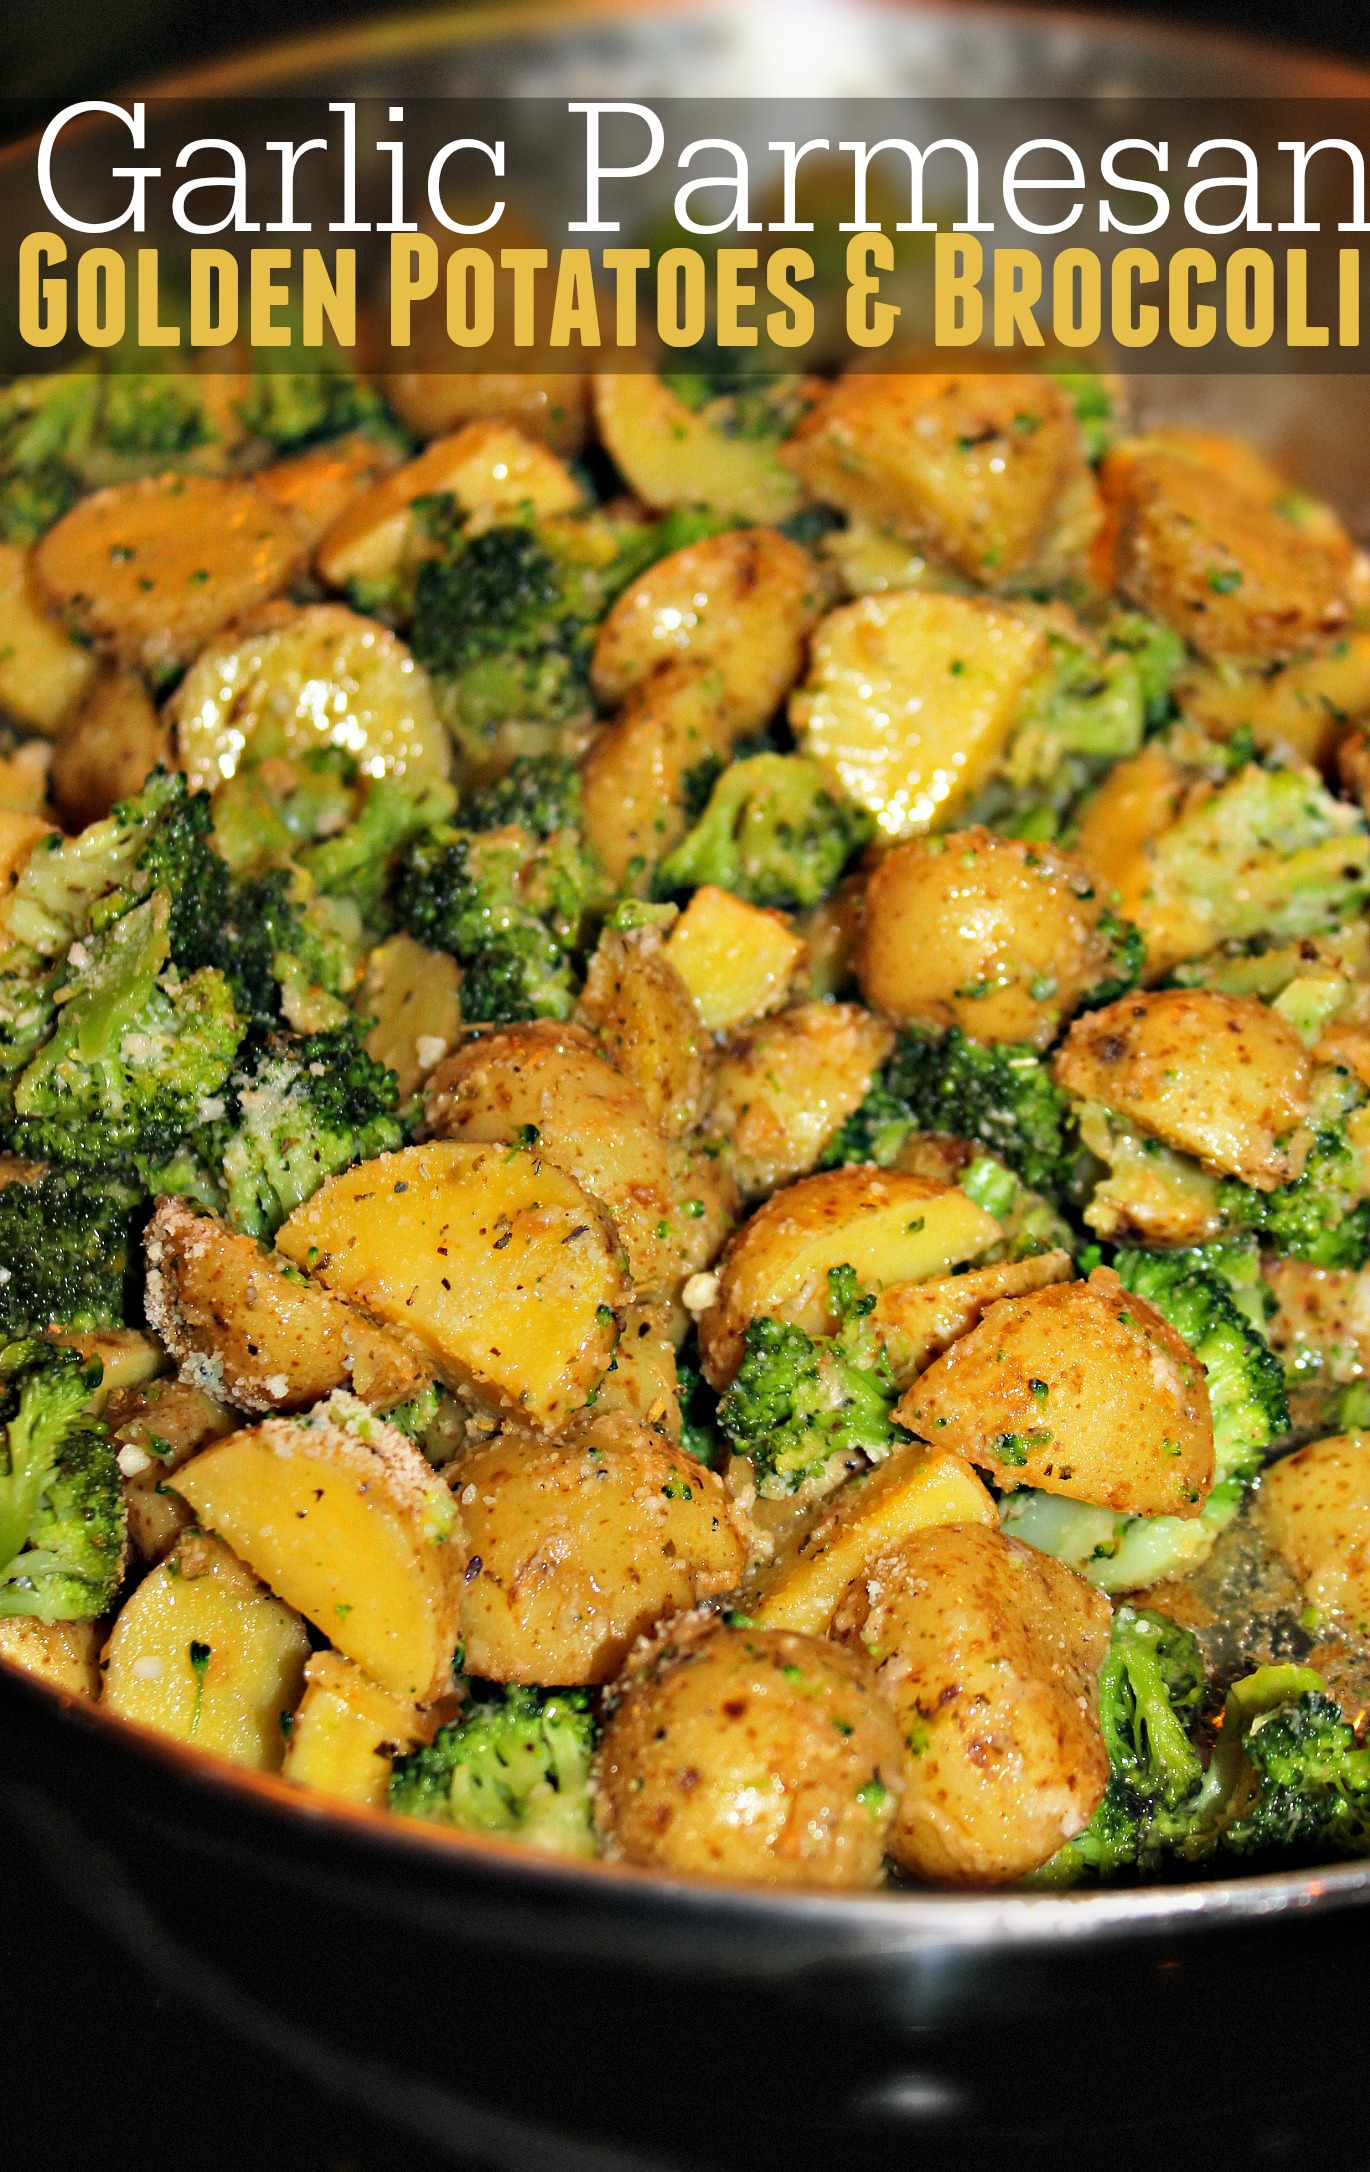 Garlic Parmesan Golden Potatoes  BroccoliSimply Taralynn